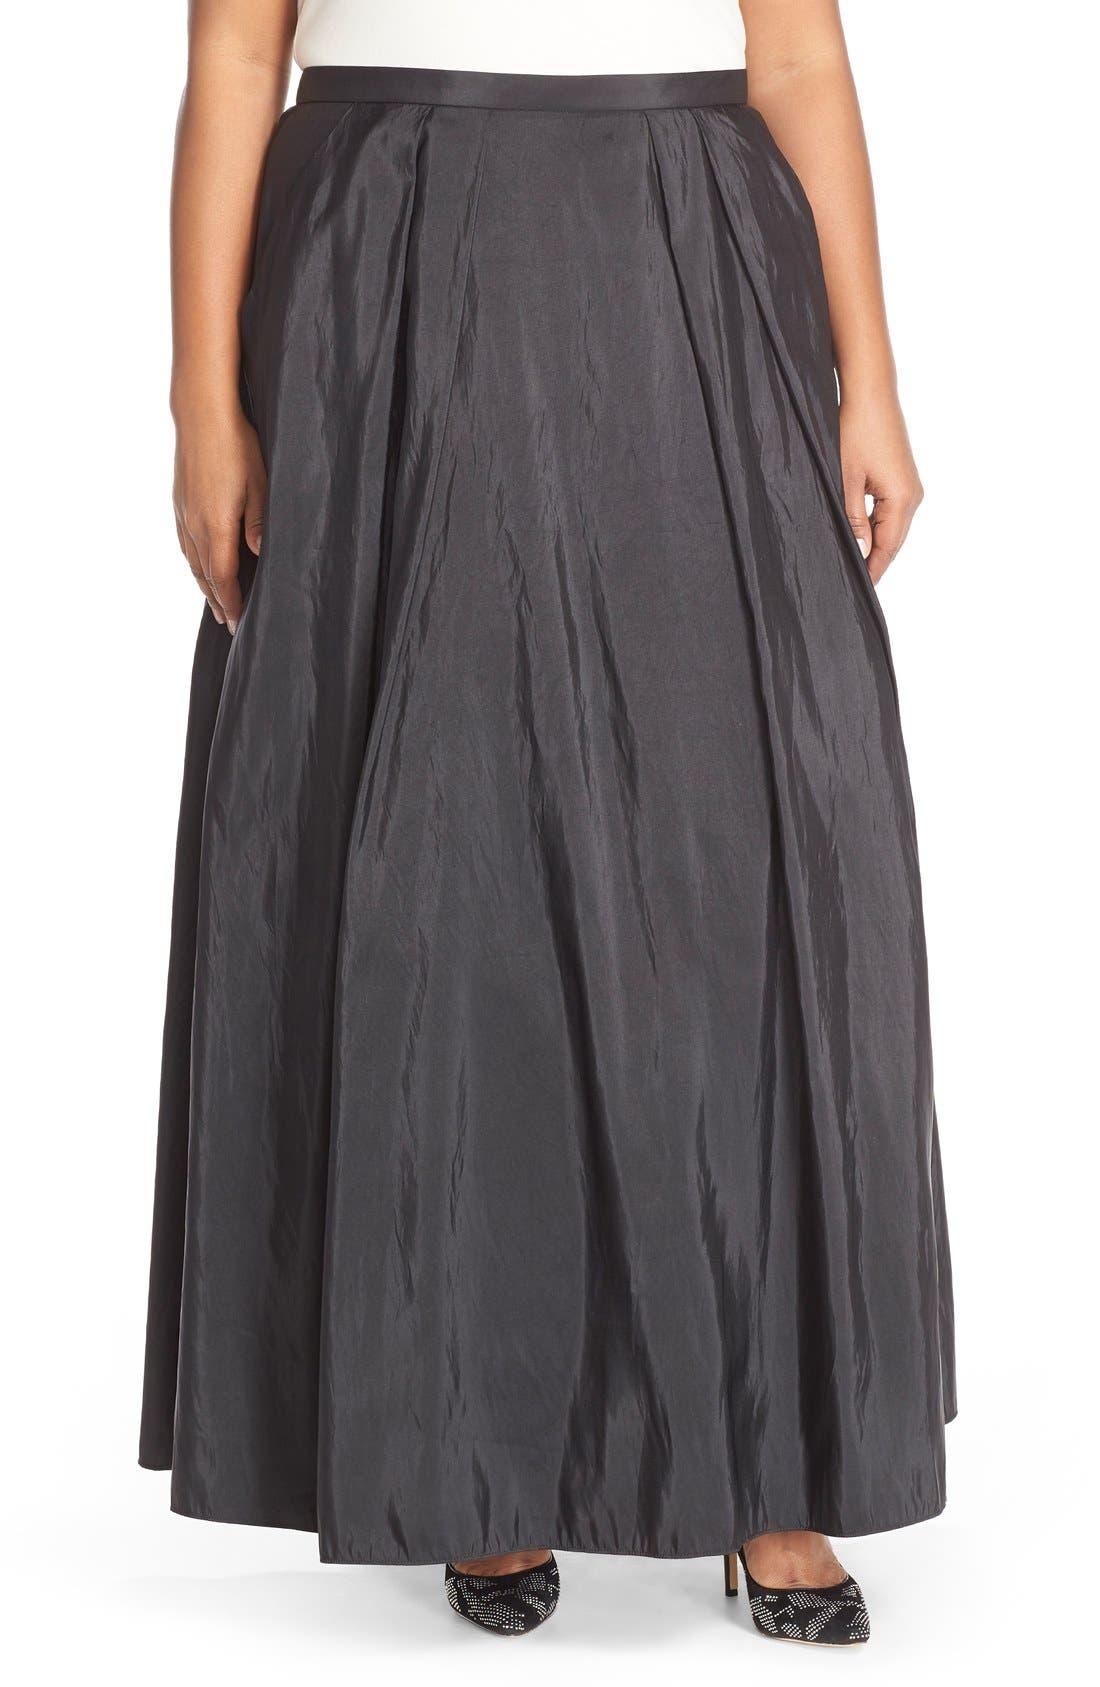 Main Image - Alex Evenings Taffeta Ballgown Skirt (Plus Size)